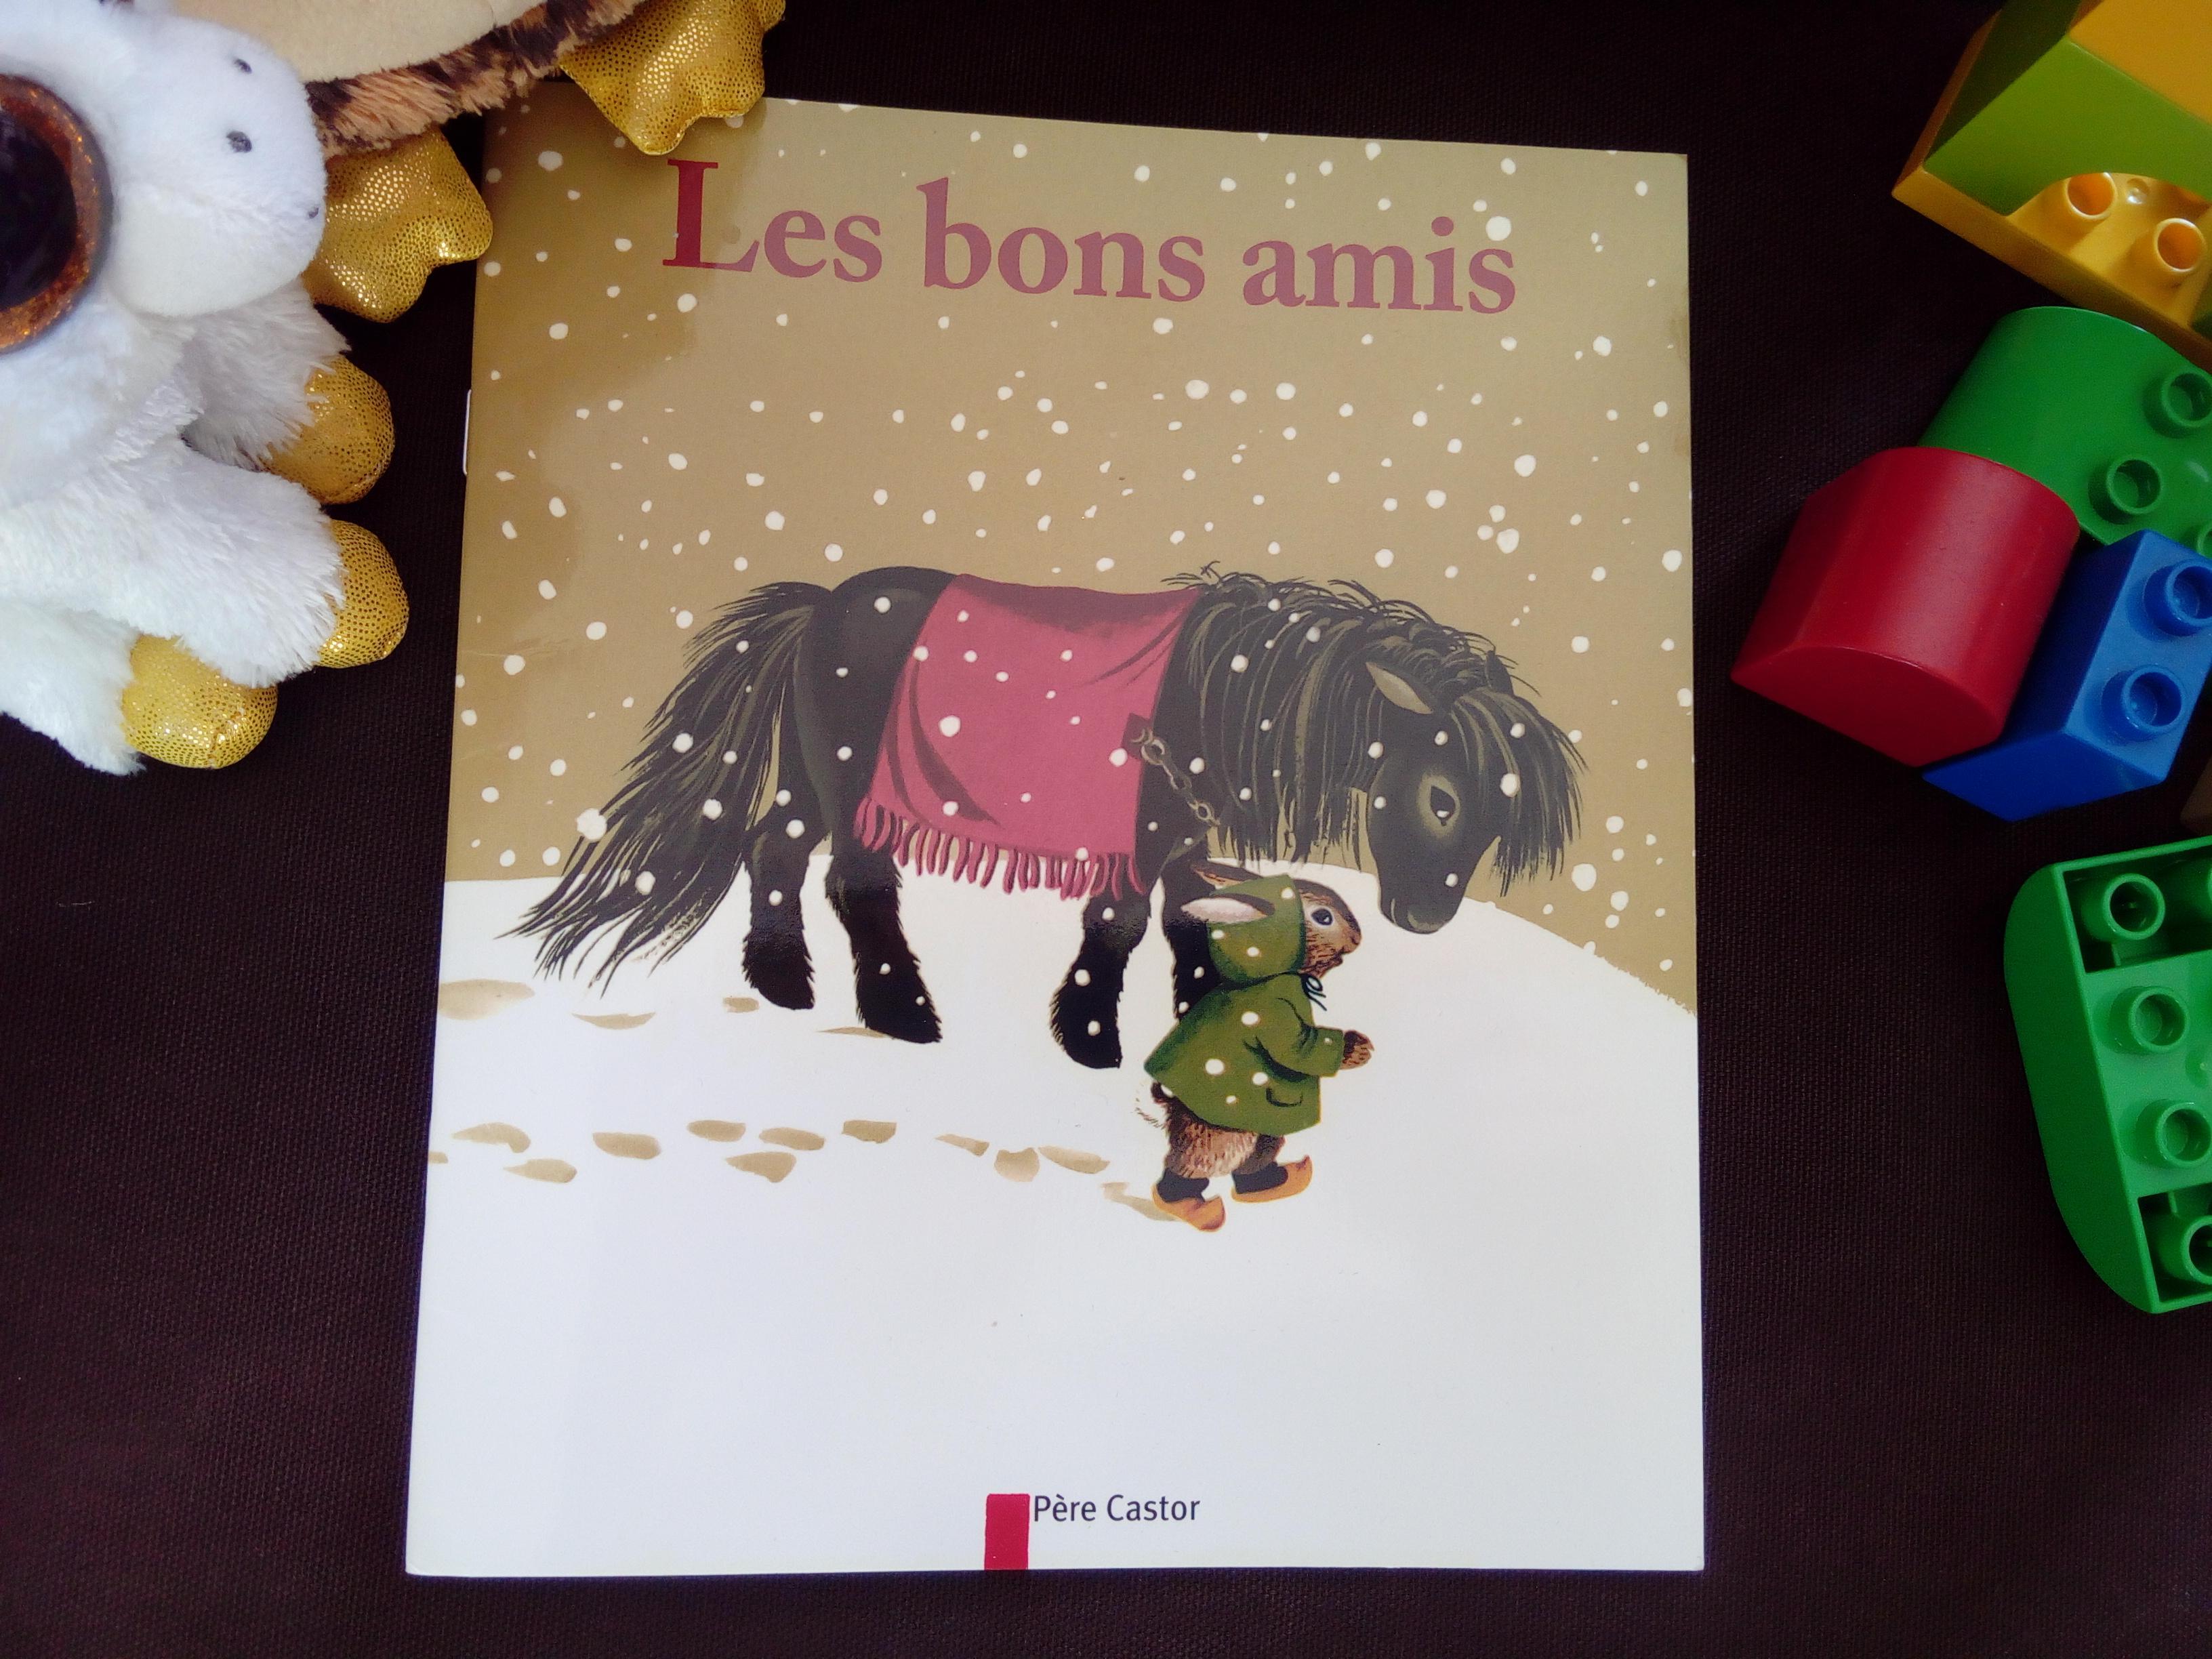 100 Amitie Texte Poemes D Amitiesle Top 50 Des Fails